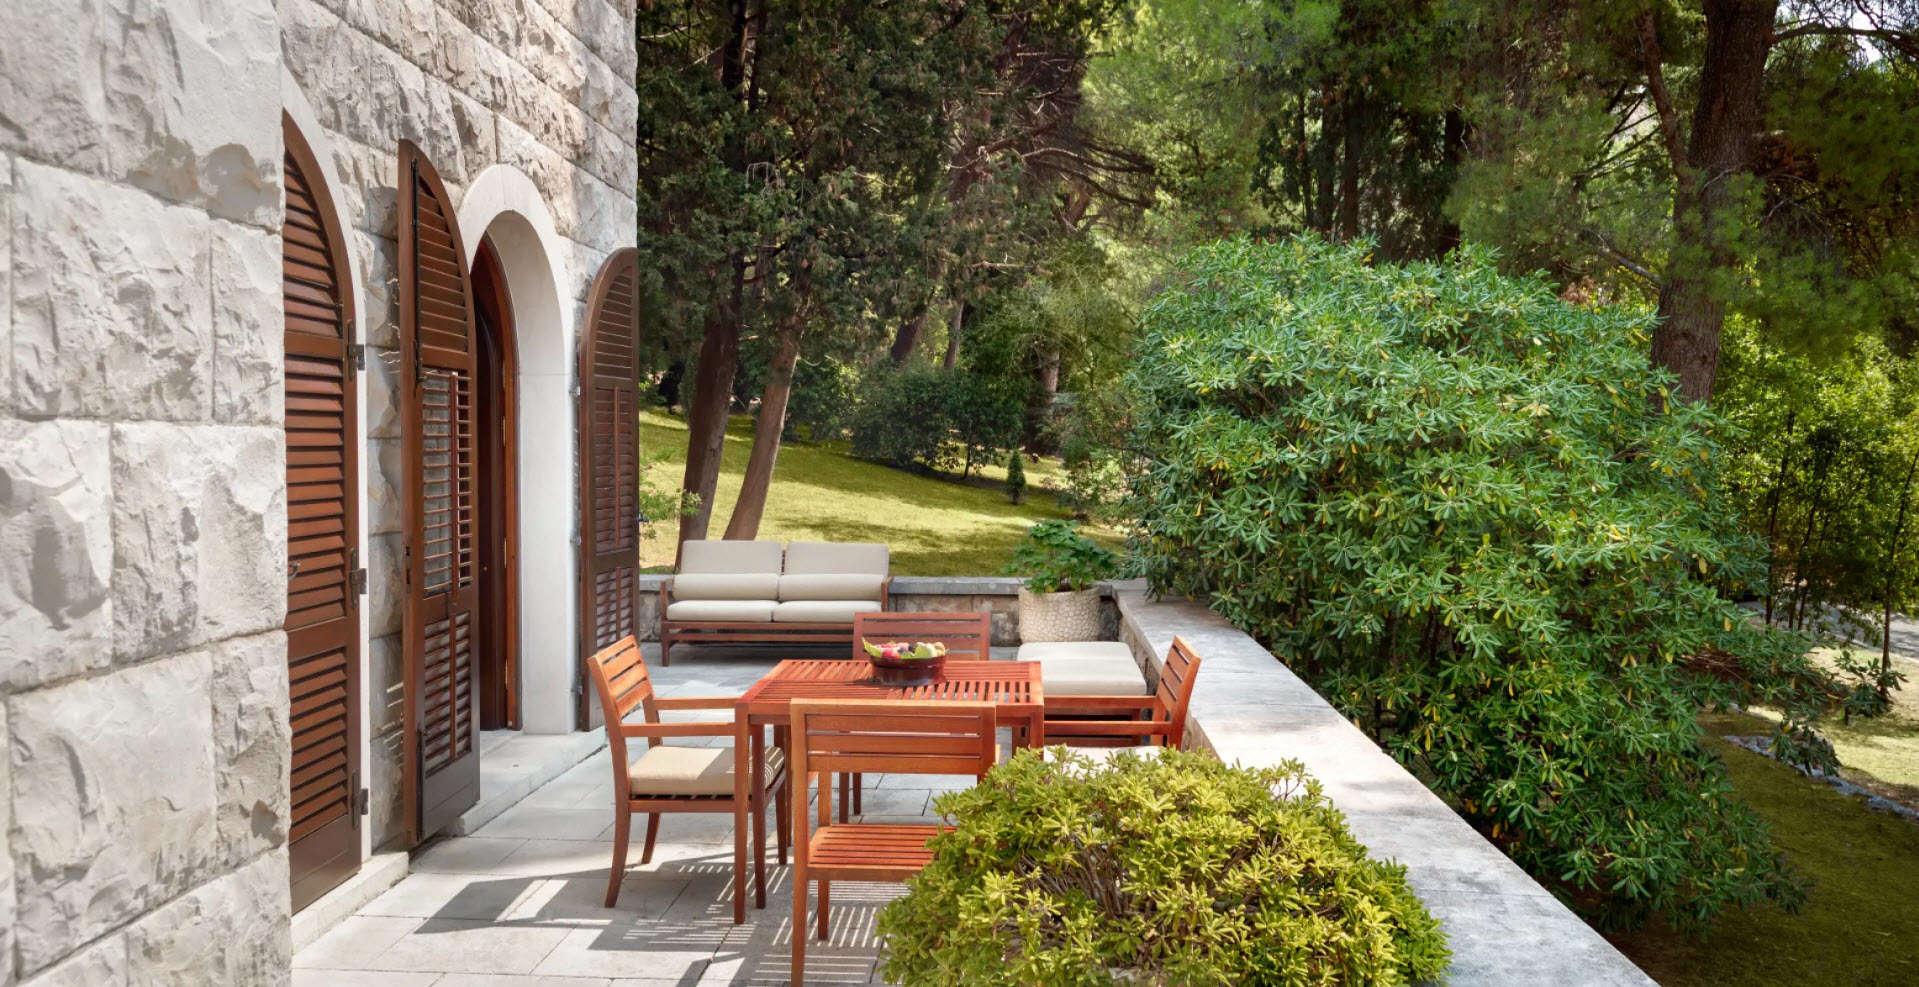 Luxury vacation rentals europe - Montenegro - Aman sveti stefan - No location 4 - Queen Marija Suite | Aman Sveti Stefan - Image 1/5